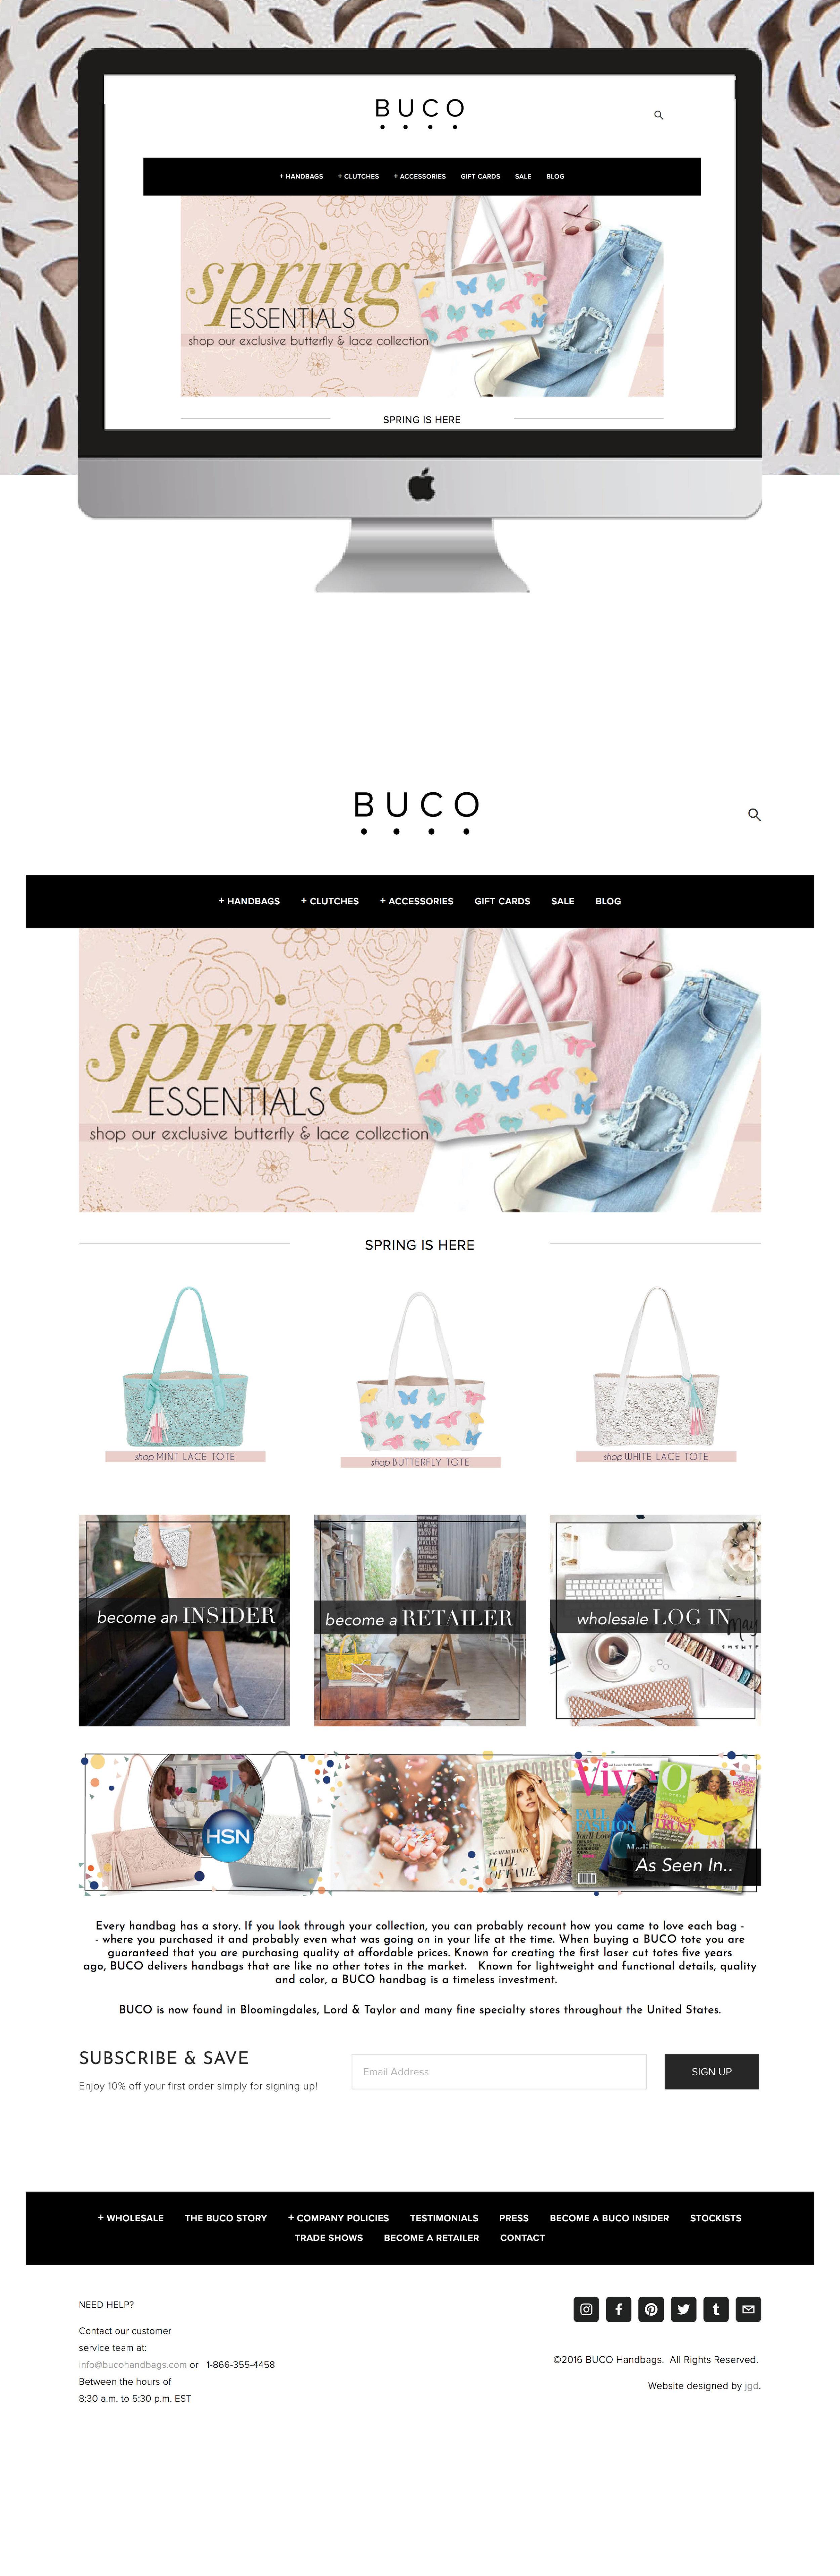 E-Commerce Squarespace Website Design for BUCO Handbags by jgdigital.co